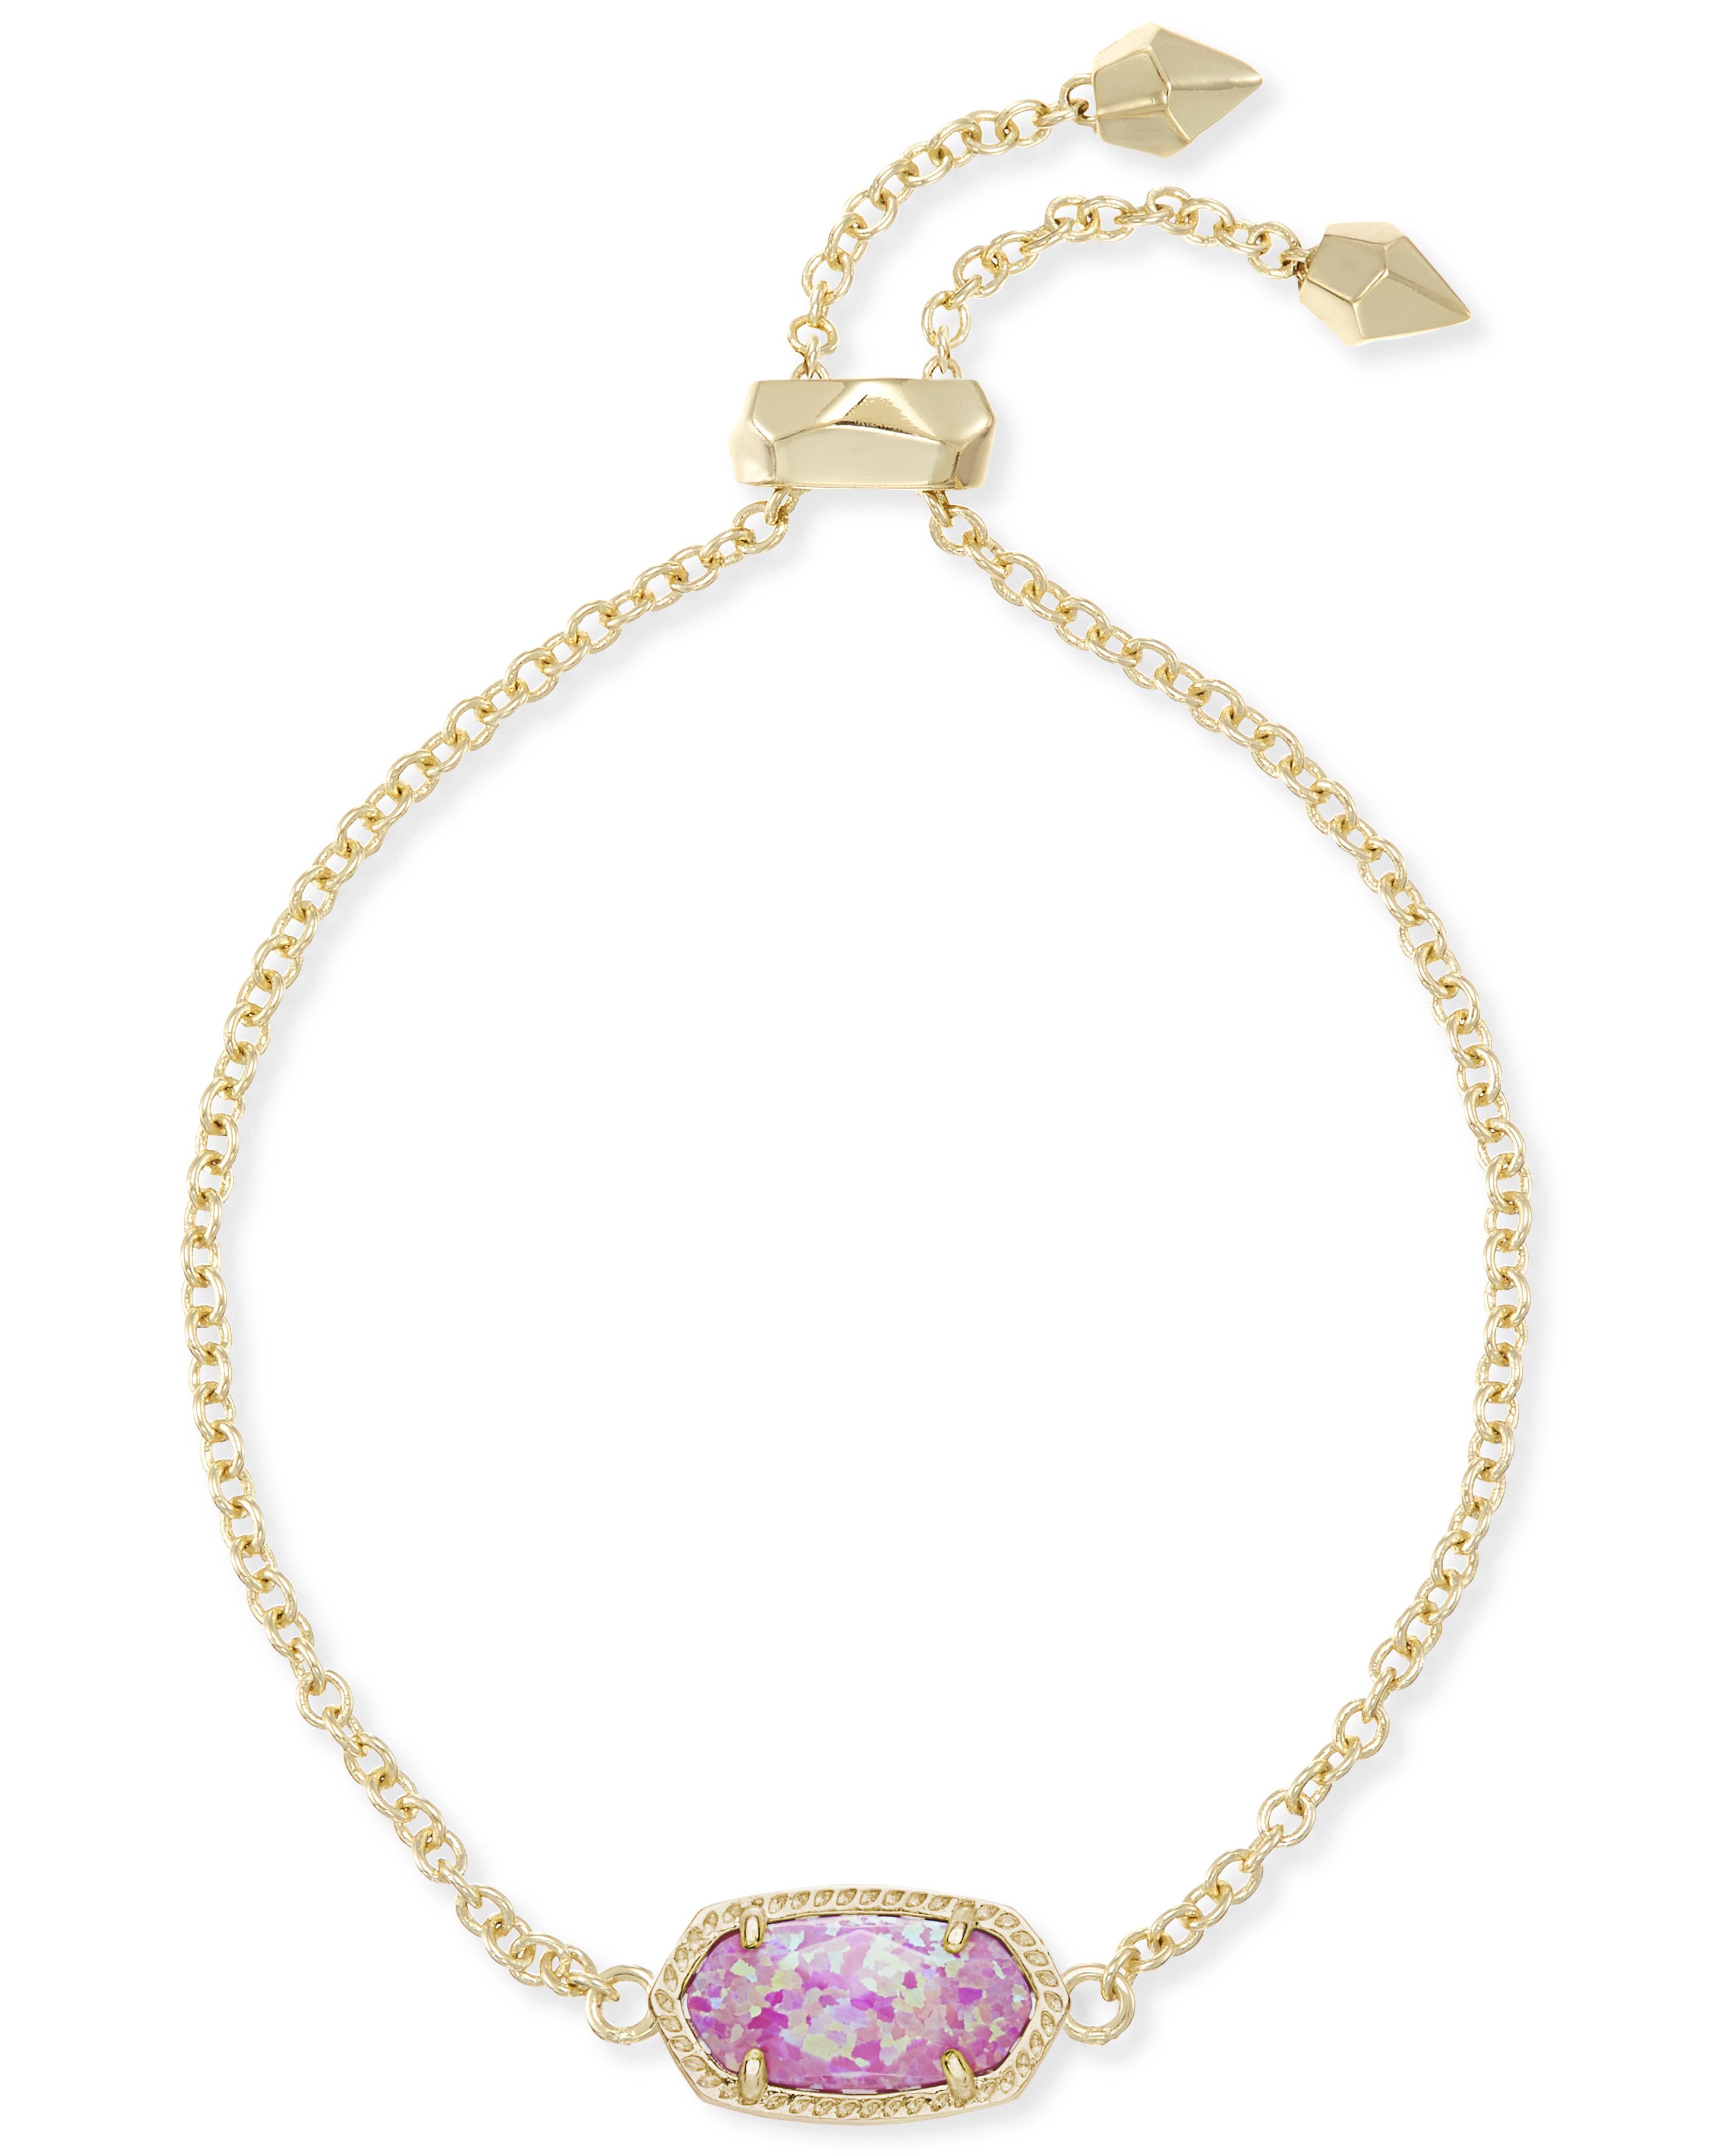 6f2f82a91e638 Elaina Fuchsia Opal Op09 Gold Tone Bracelet - 4217714532